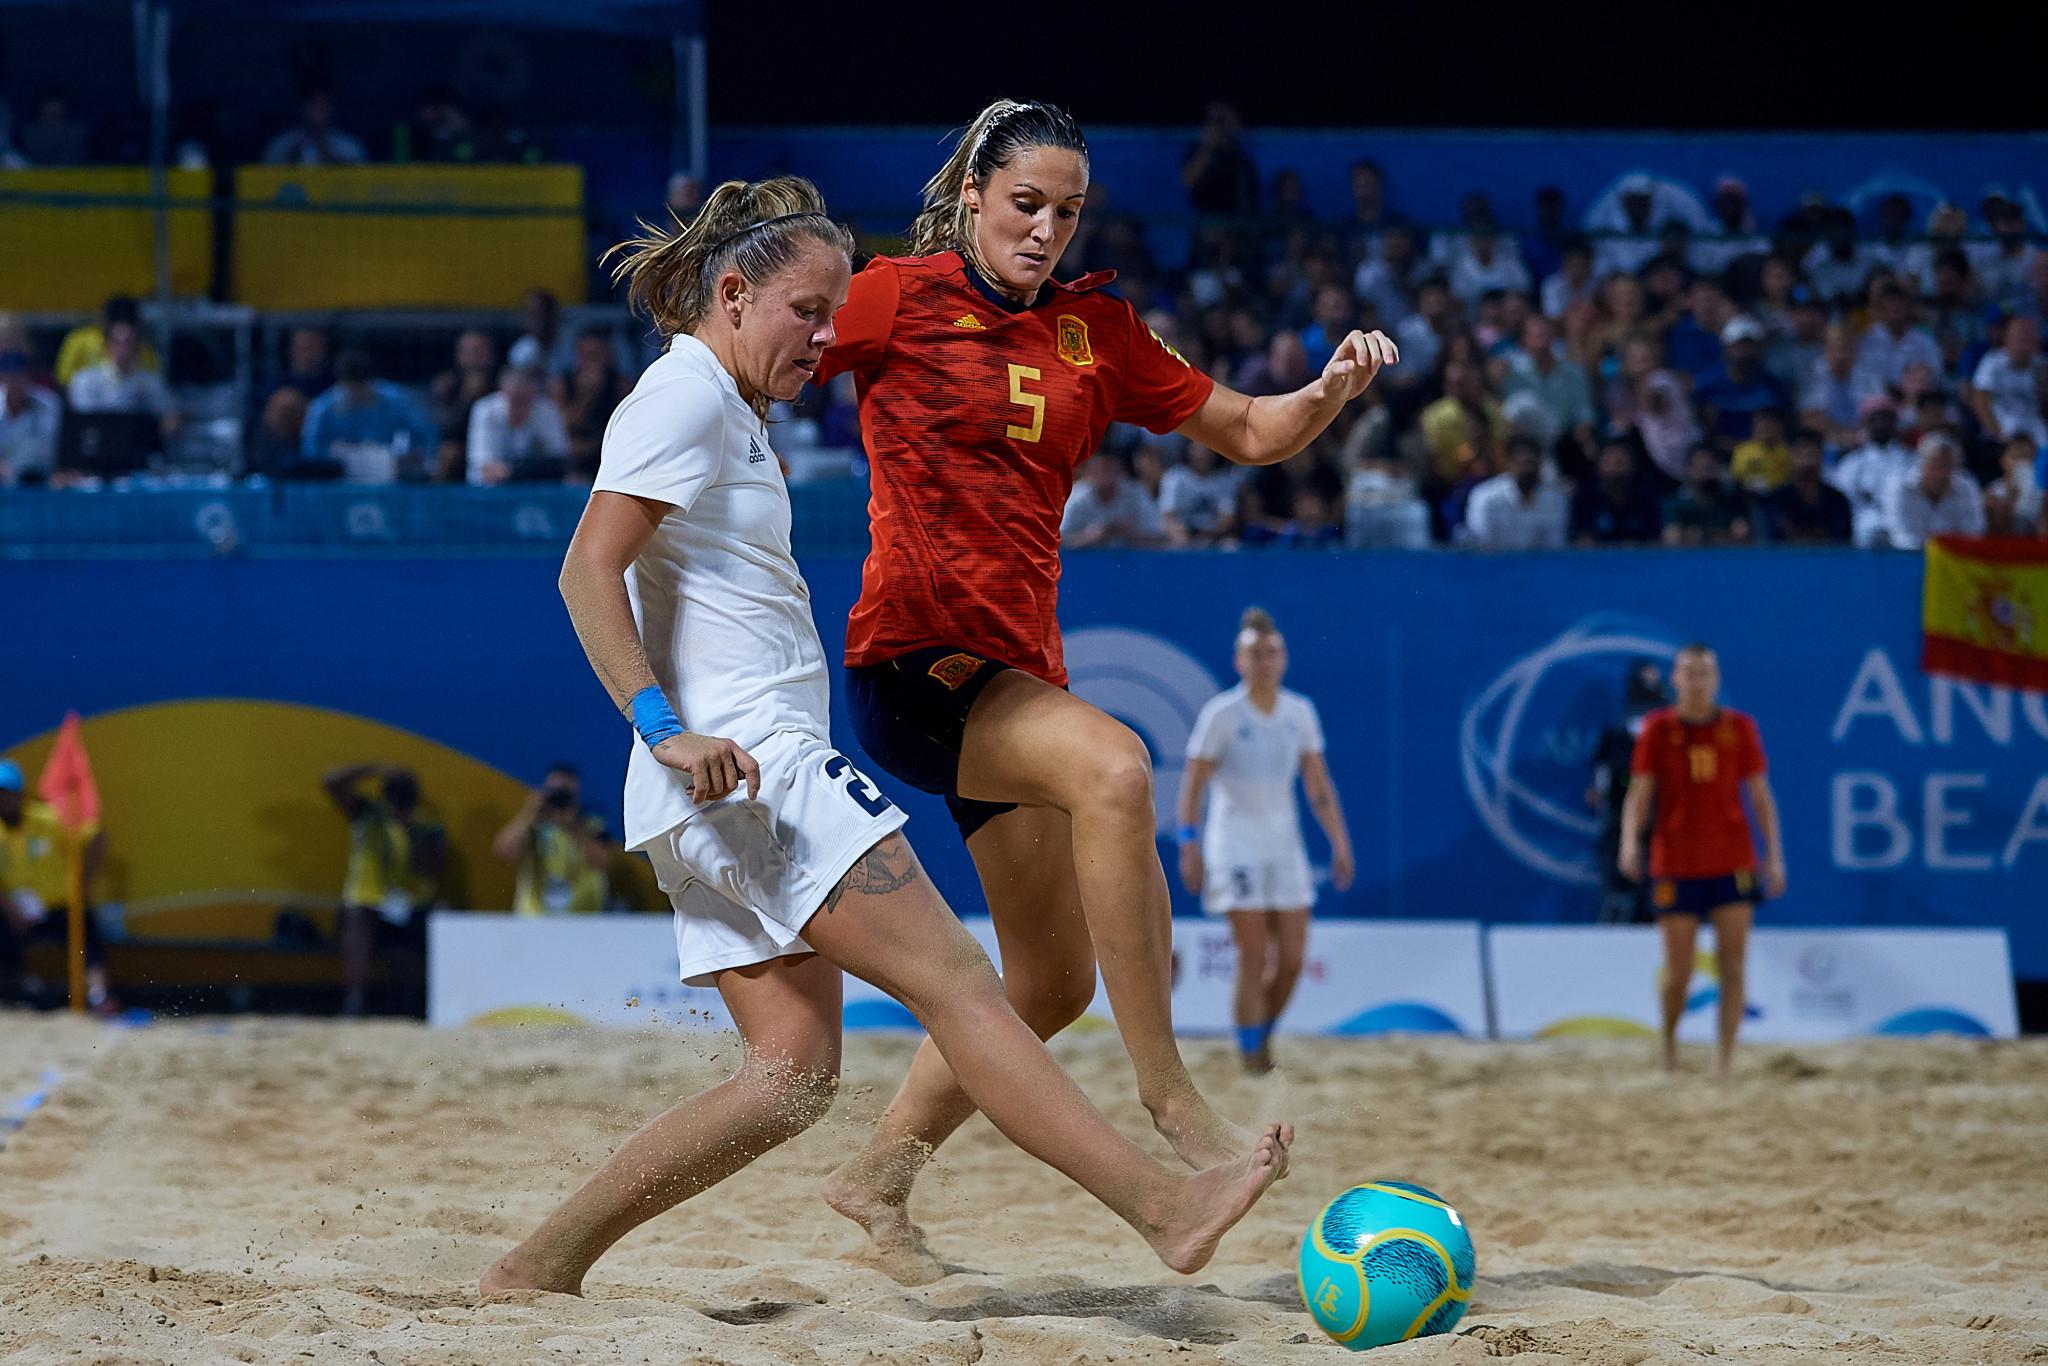 Spain's Lorena del Carmen Asensio scored twice as her country beat Britain 3-2 ©ANOC World Beach Games